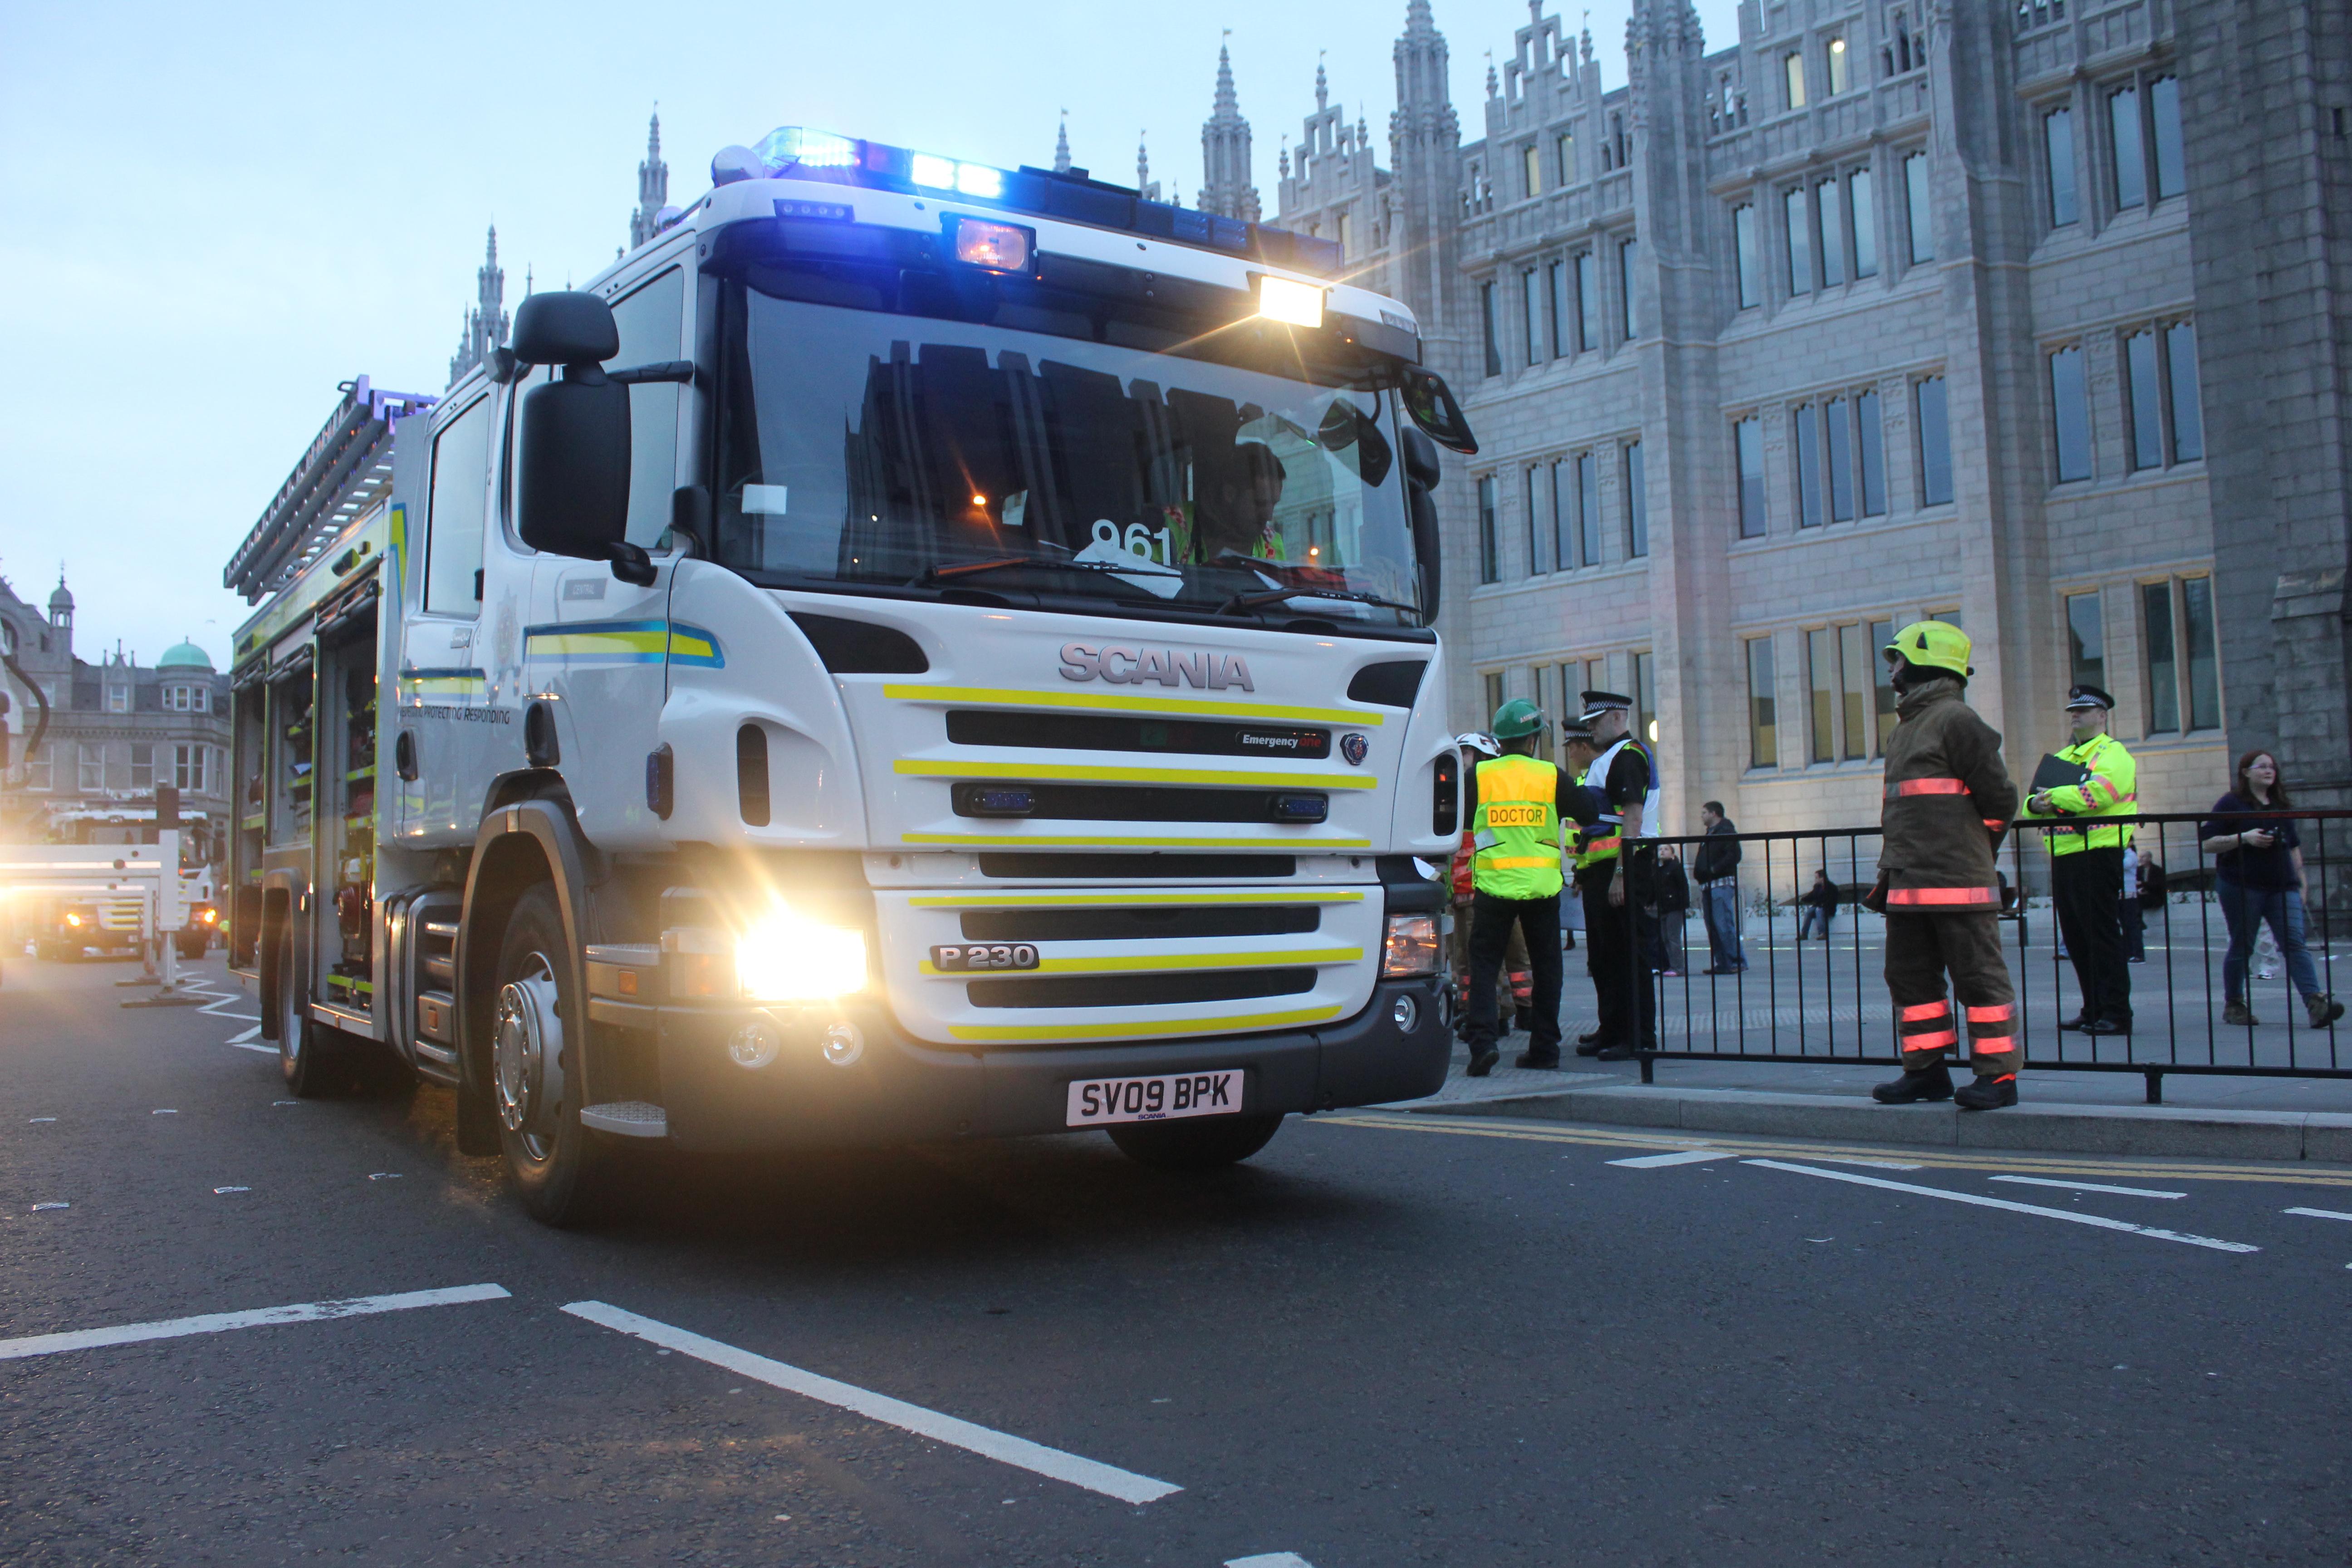 Woman dies in Aberdeenshire fire